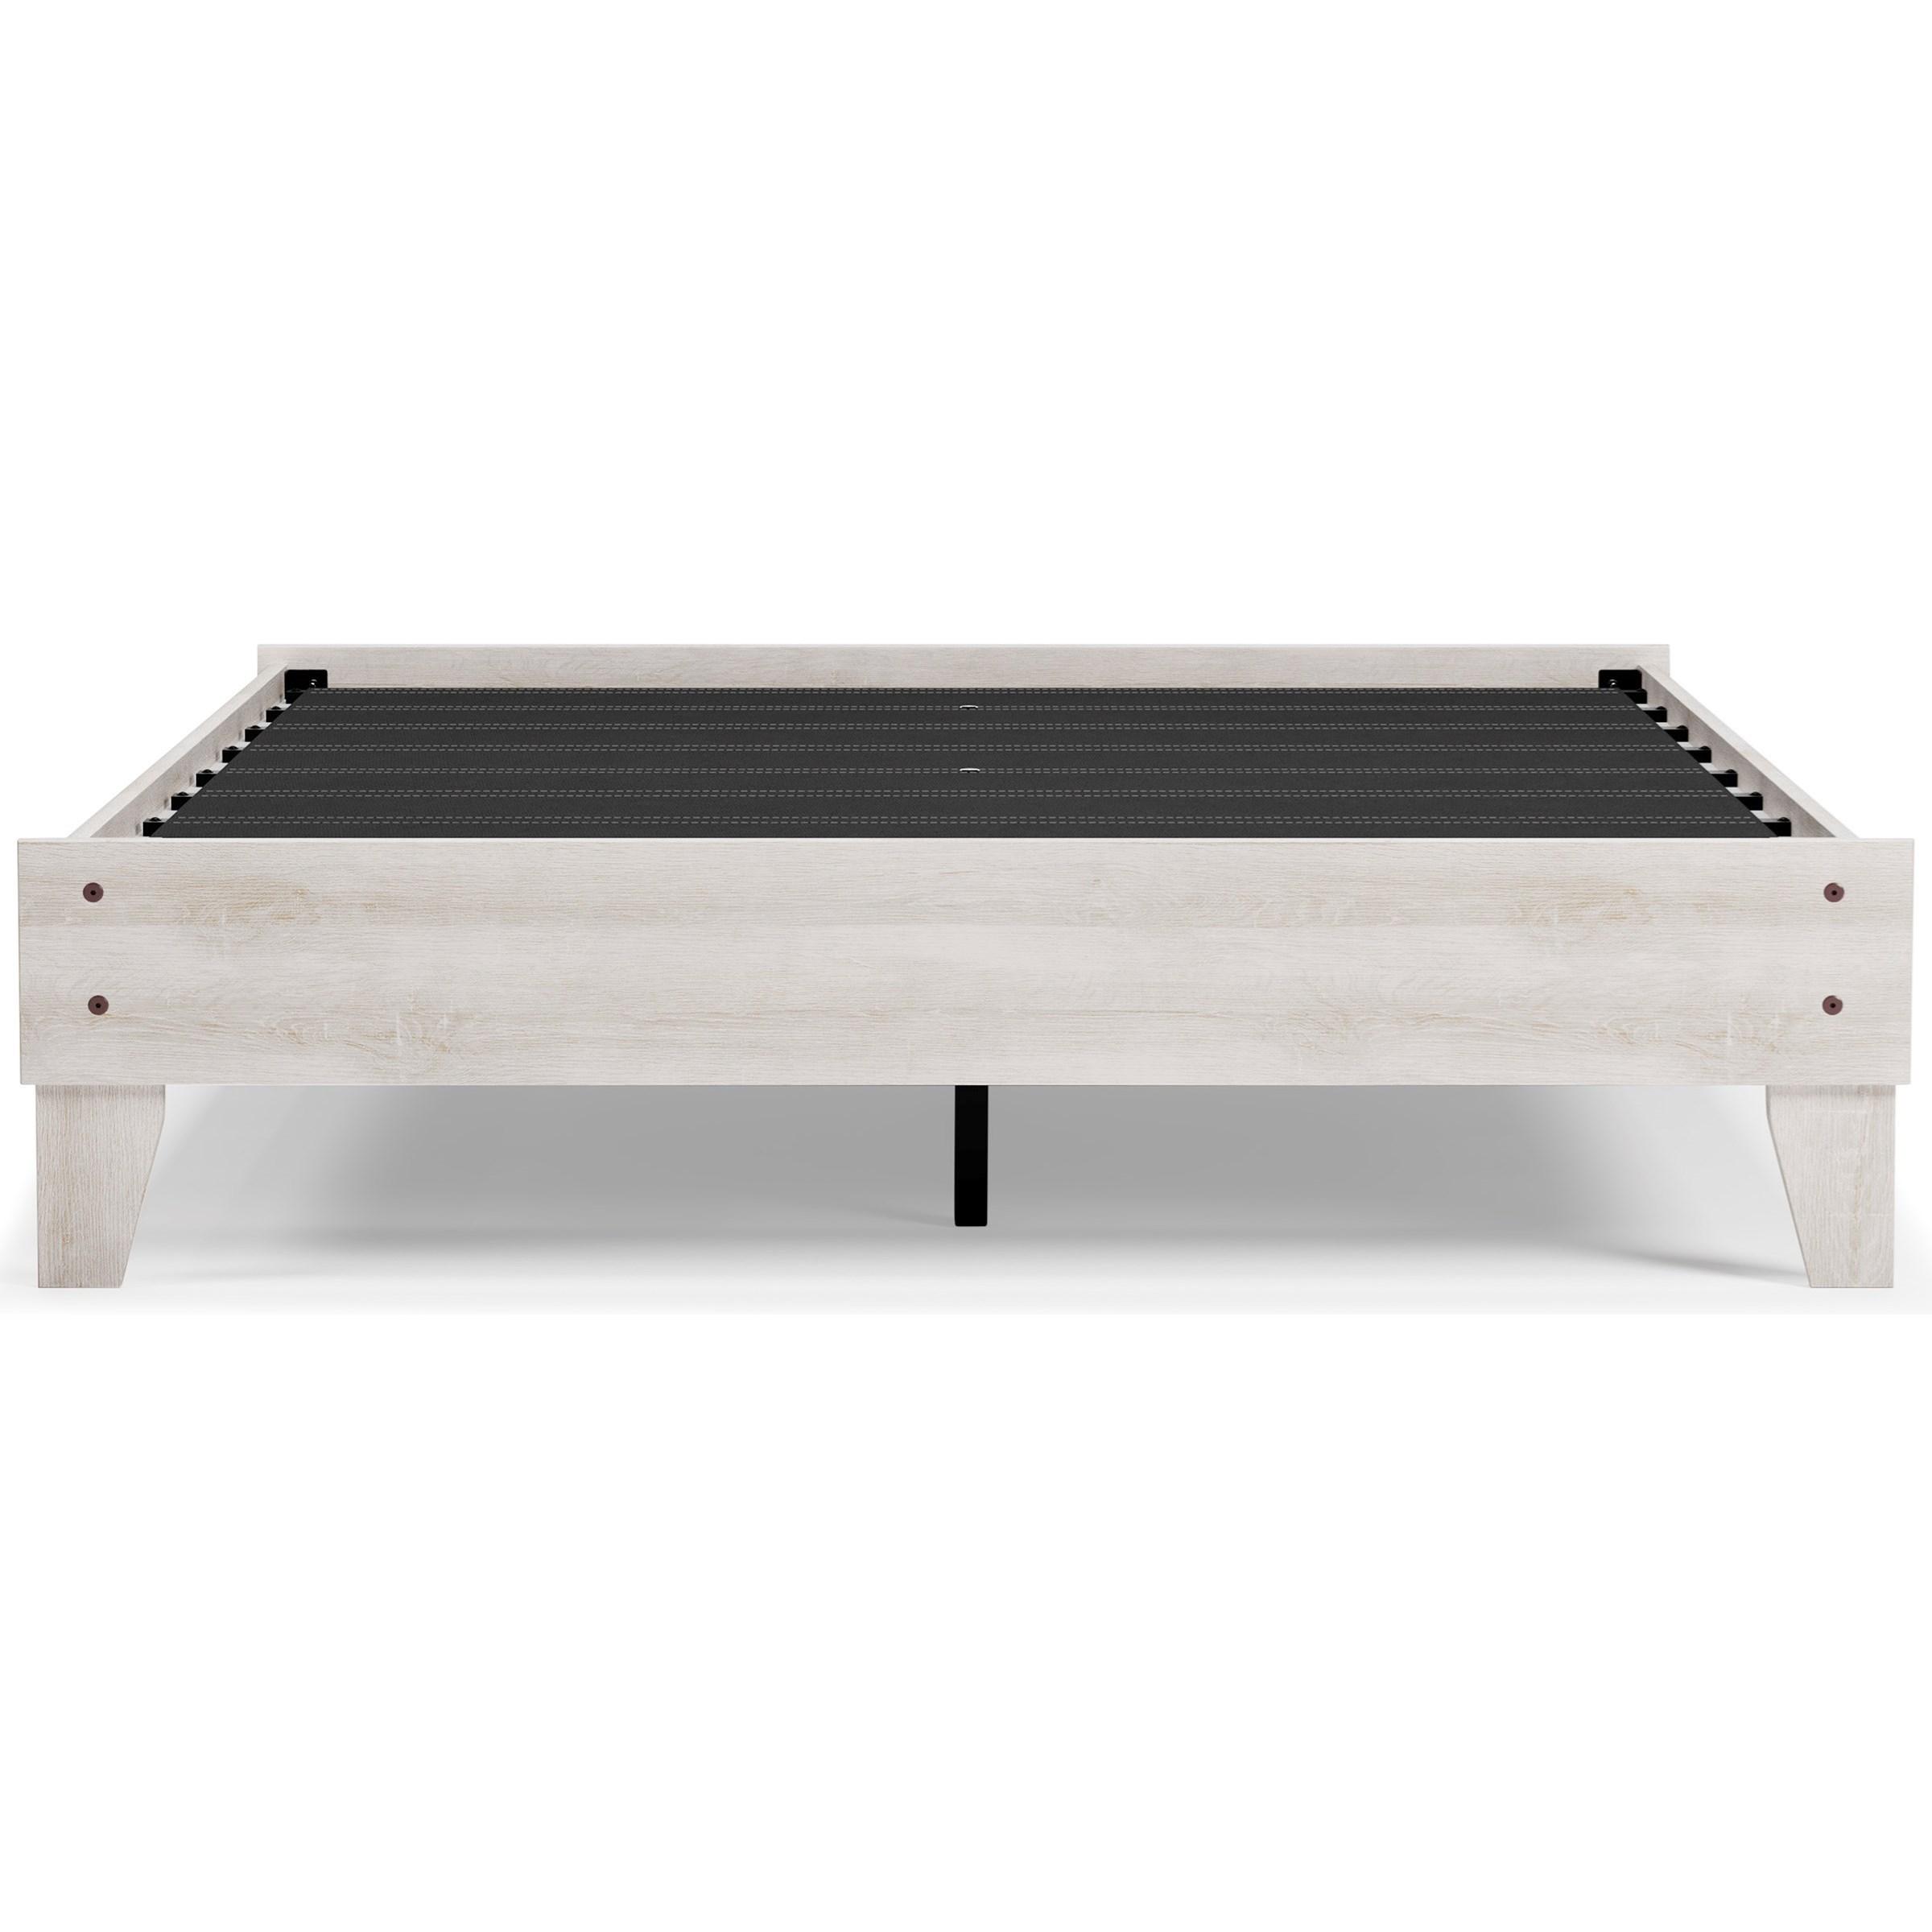 Shawburn Queen Platform Bed by Ashley (Signature Design) at Johnny Janosik